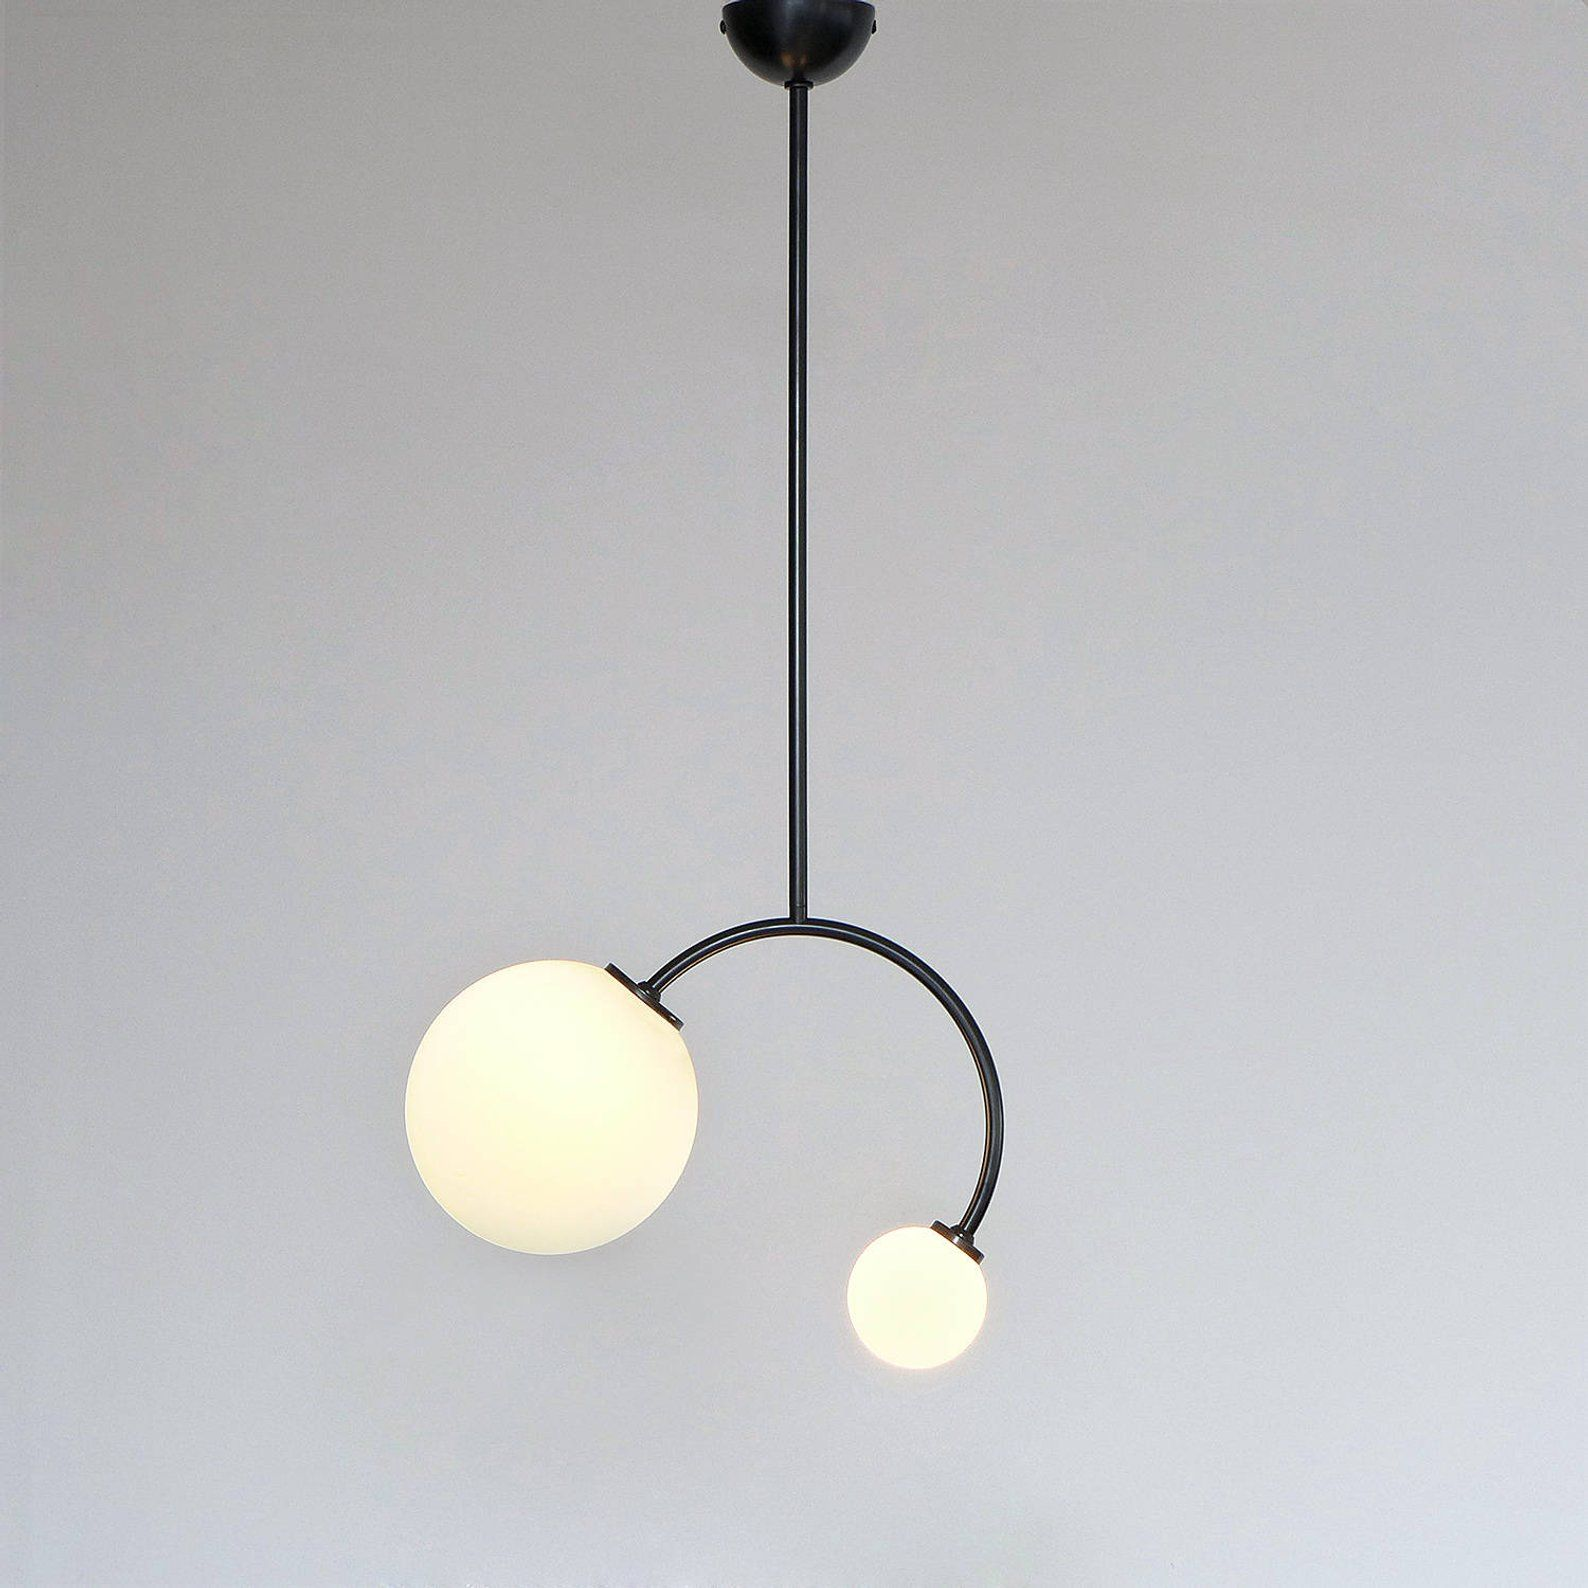 Minimal Modern Two Size Globe Shades Geometric Pendant Lamp Etsy Geometric Pendant Lamps Pendant Lamp Ceiling Lamp